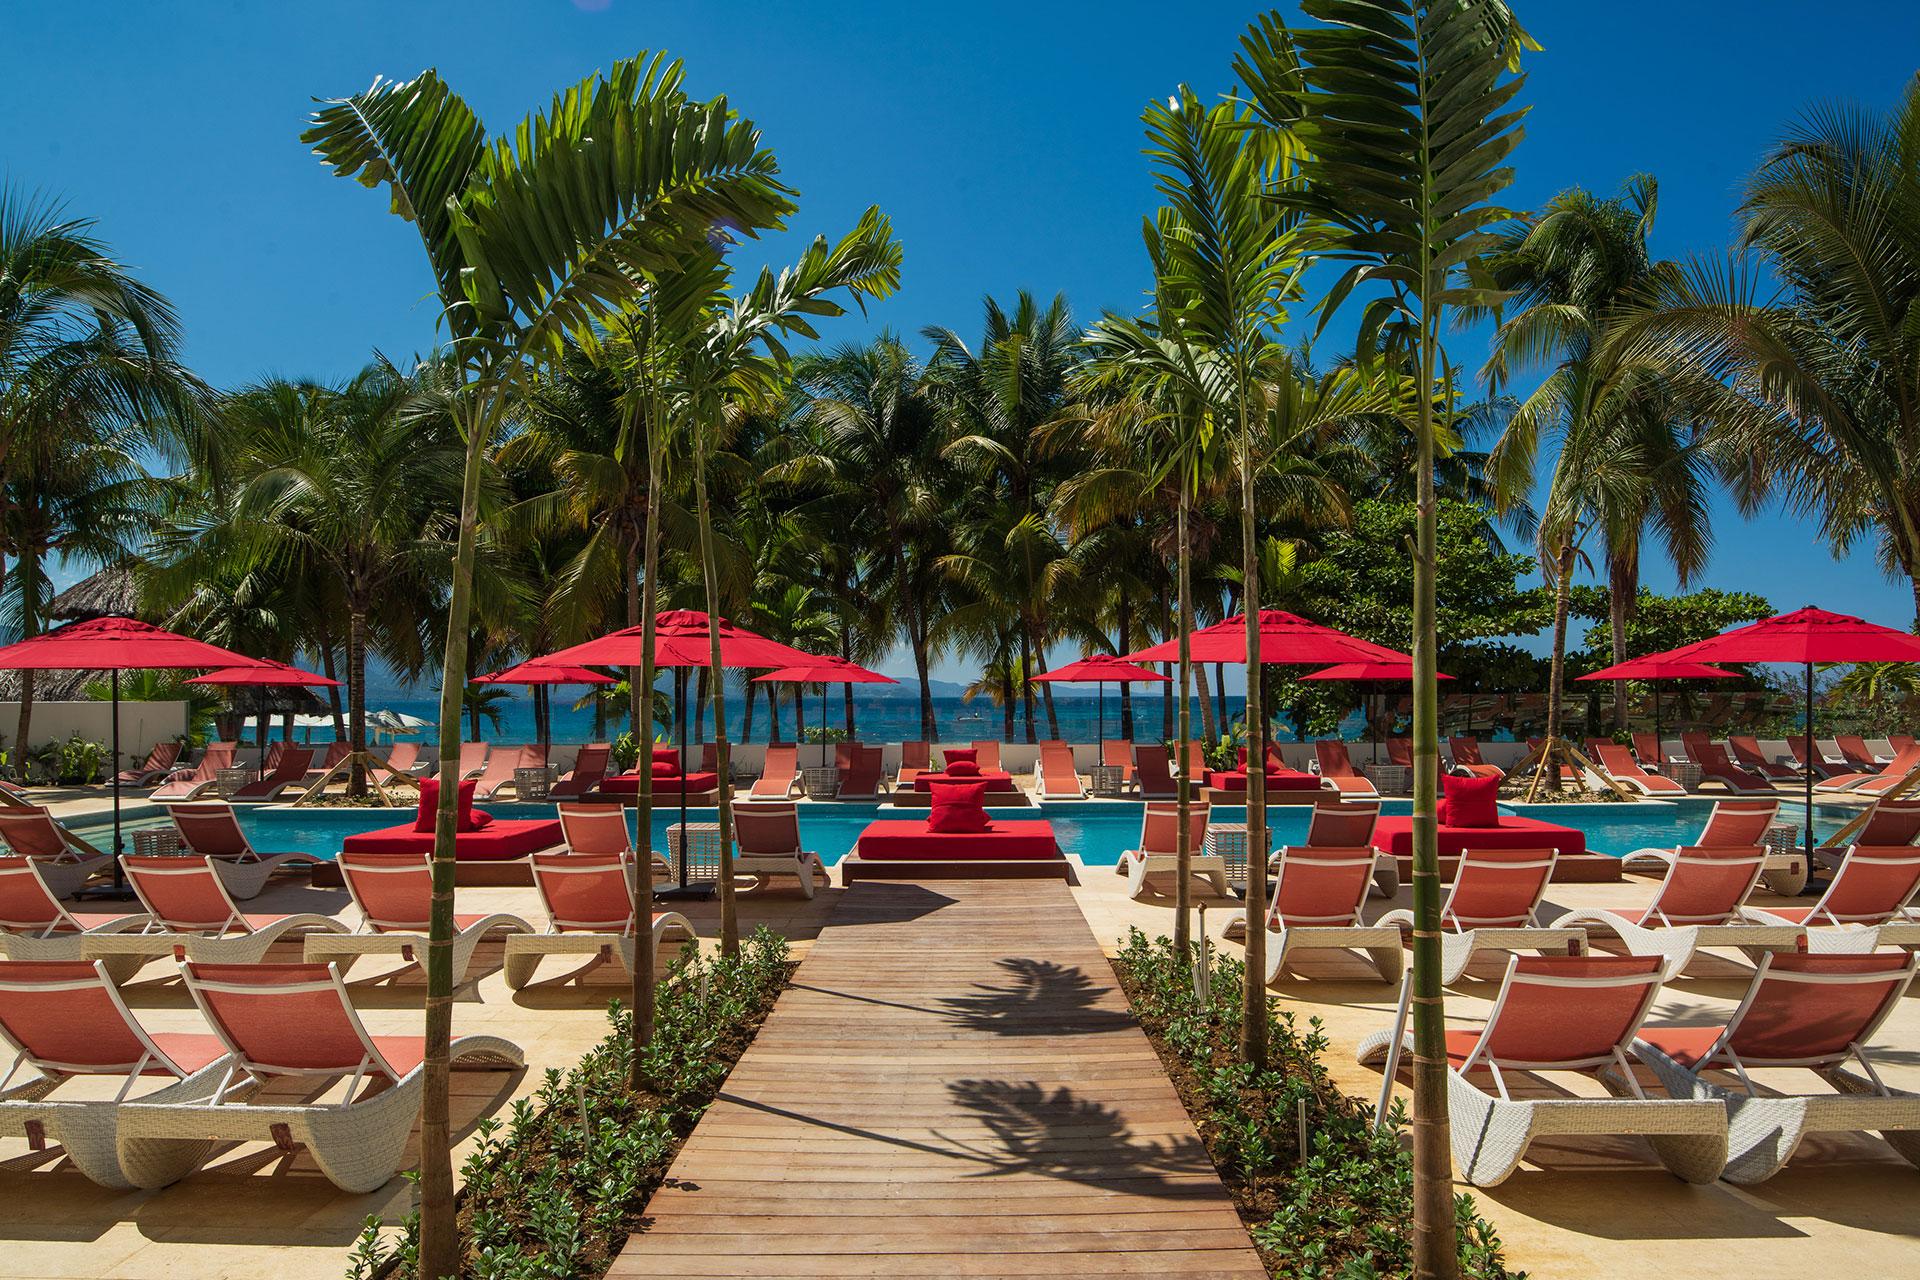 S Hotel Montego Bay Rendering; Courtesy of S Hotel Montego Bay